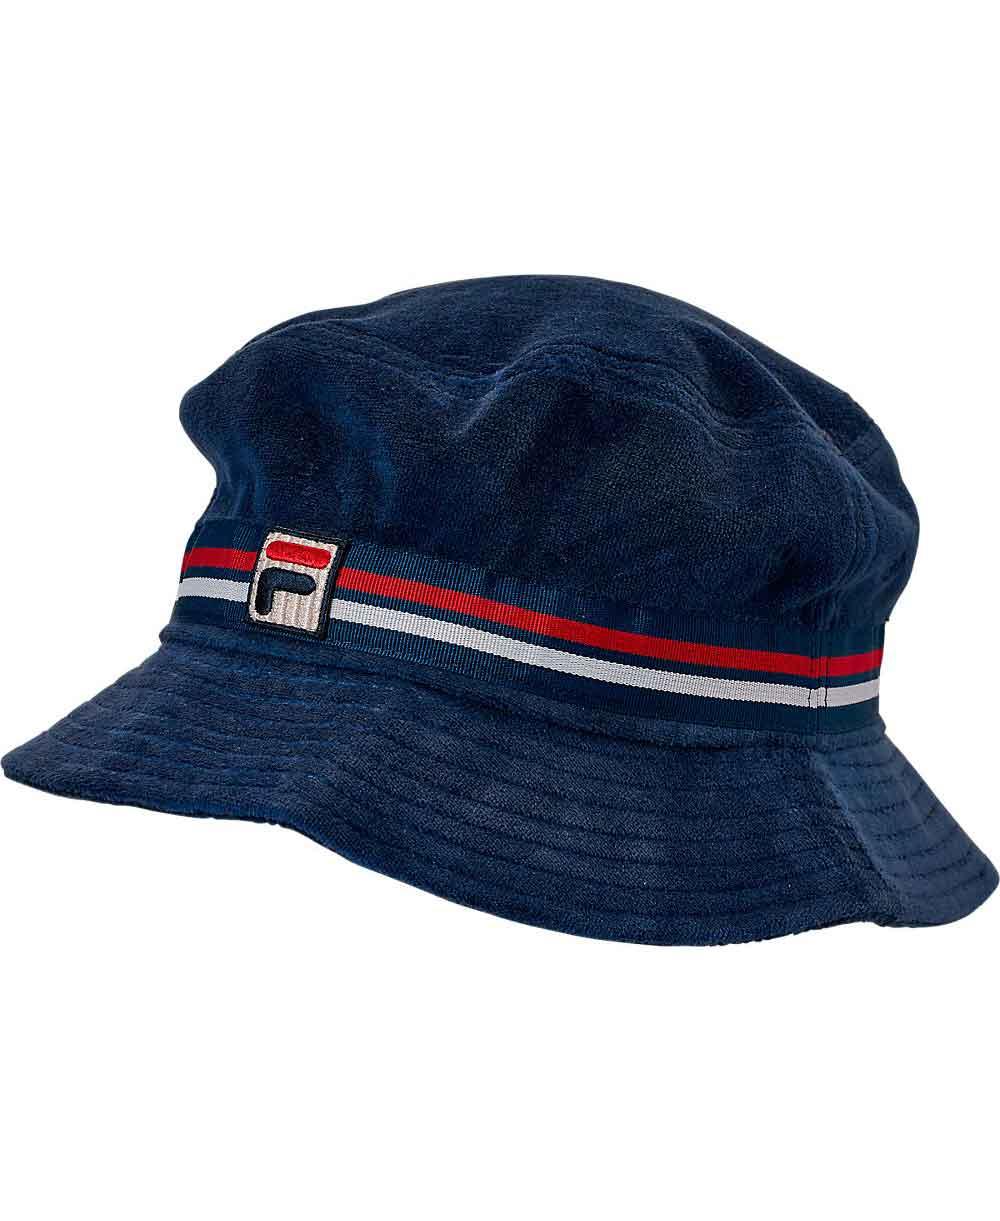 Velour Bucket Casquette Homme Navy